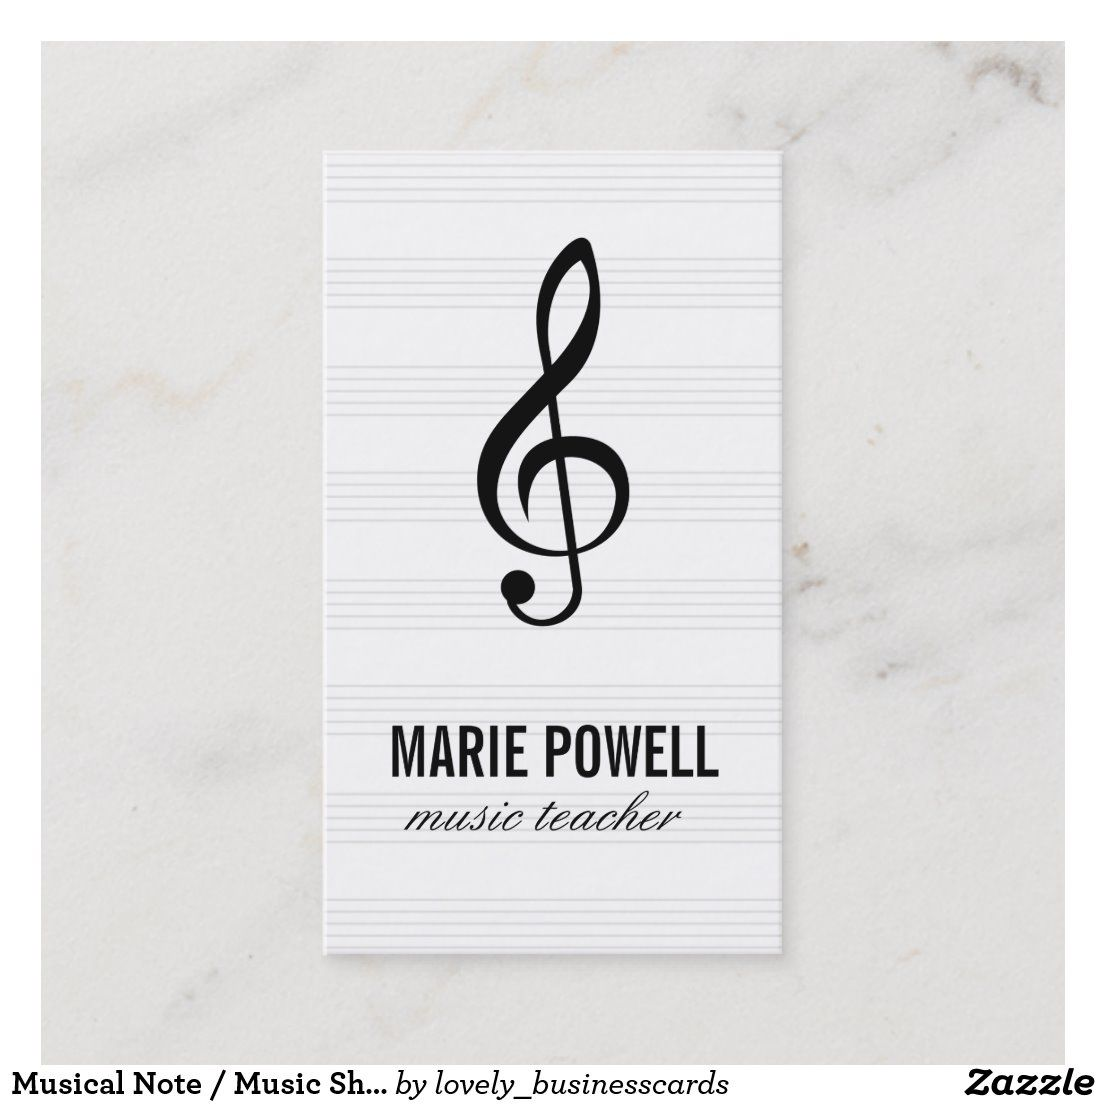 Musical Note / Music Sheet Business Card   Zazzle.com in ...